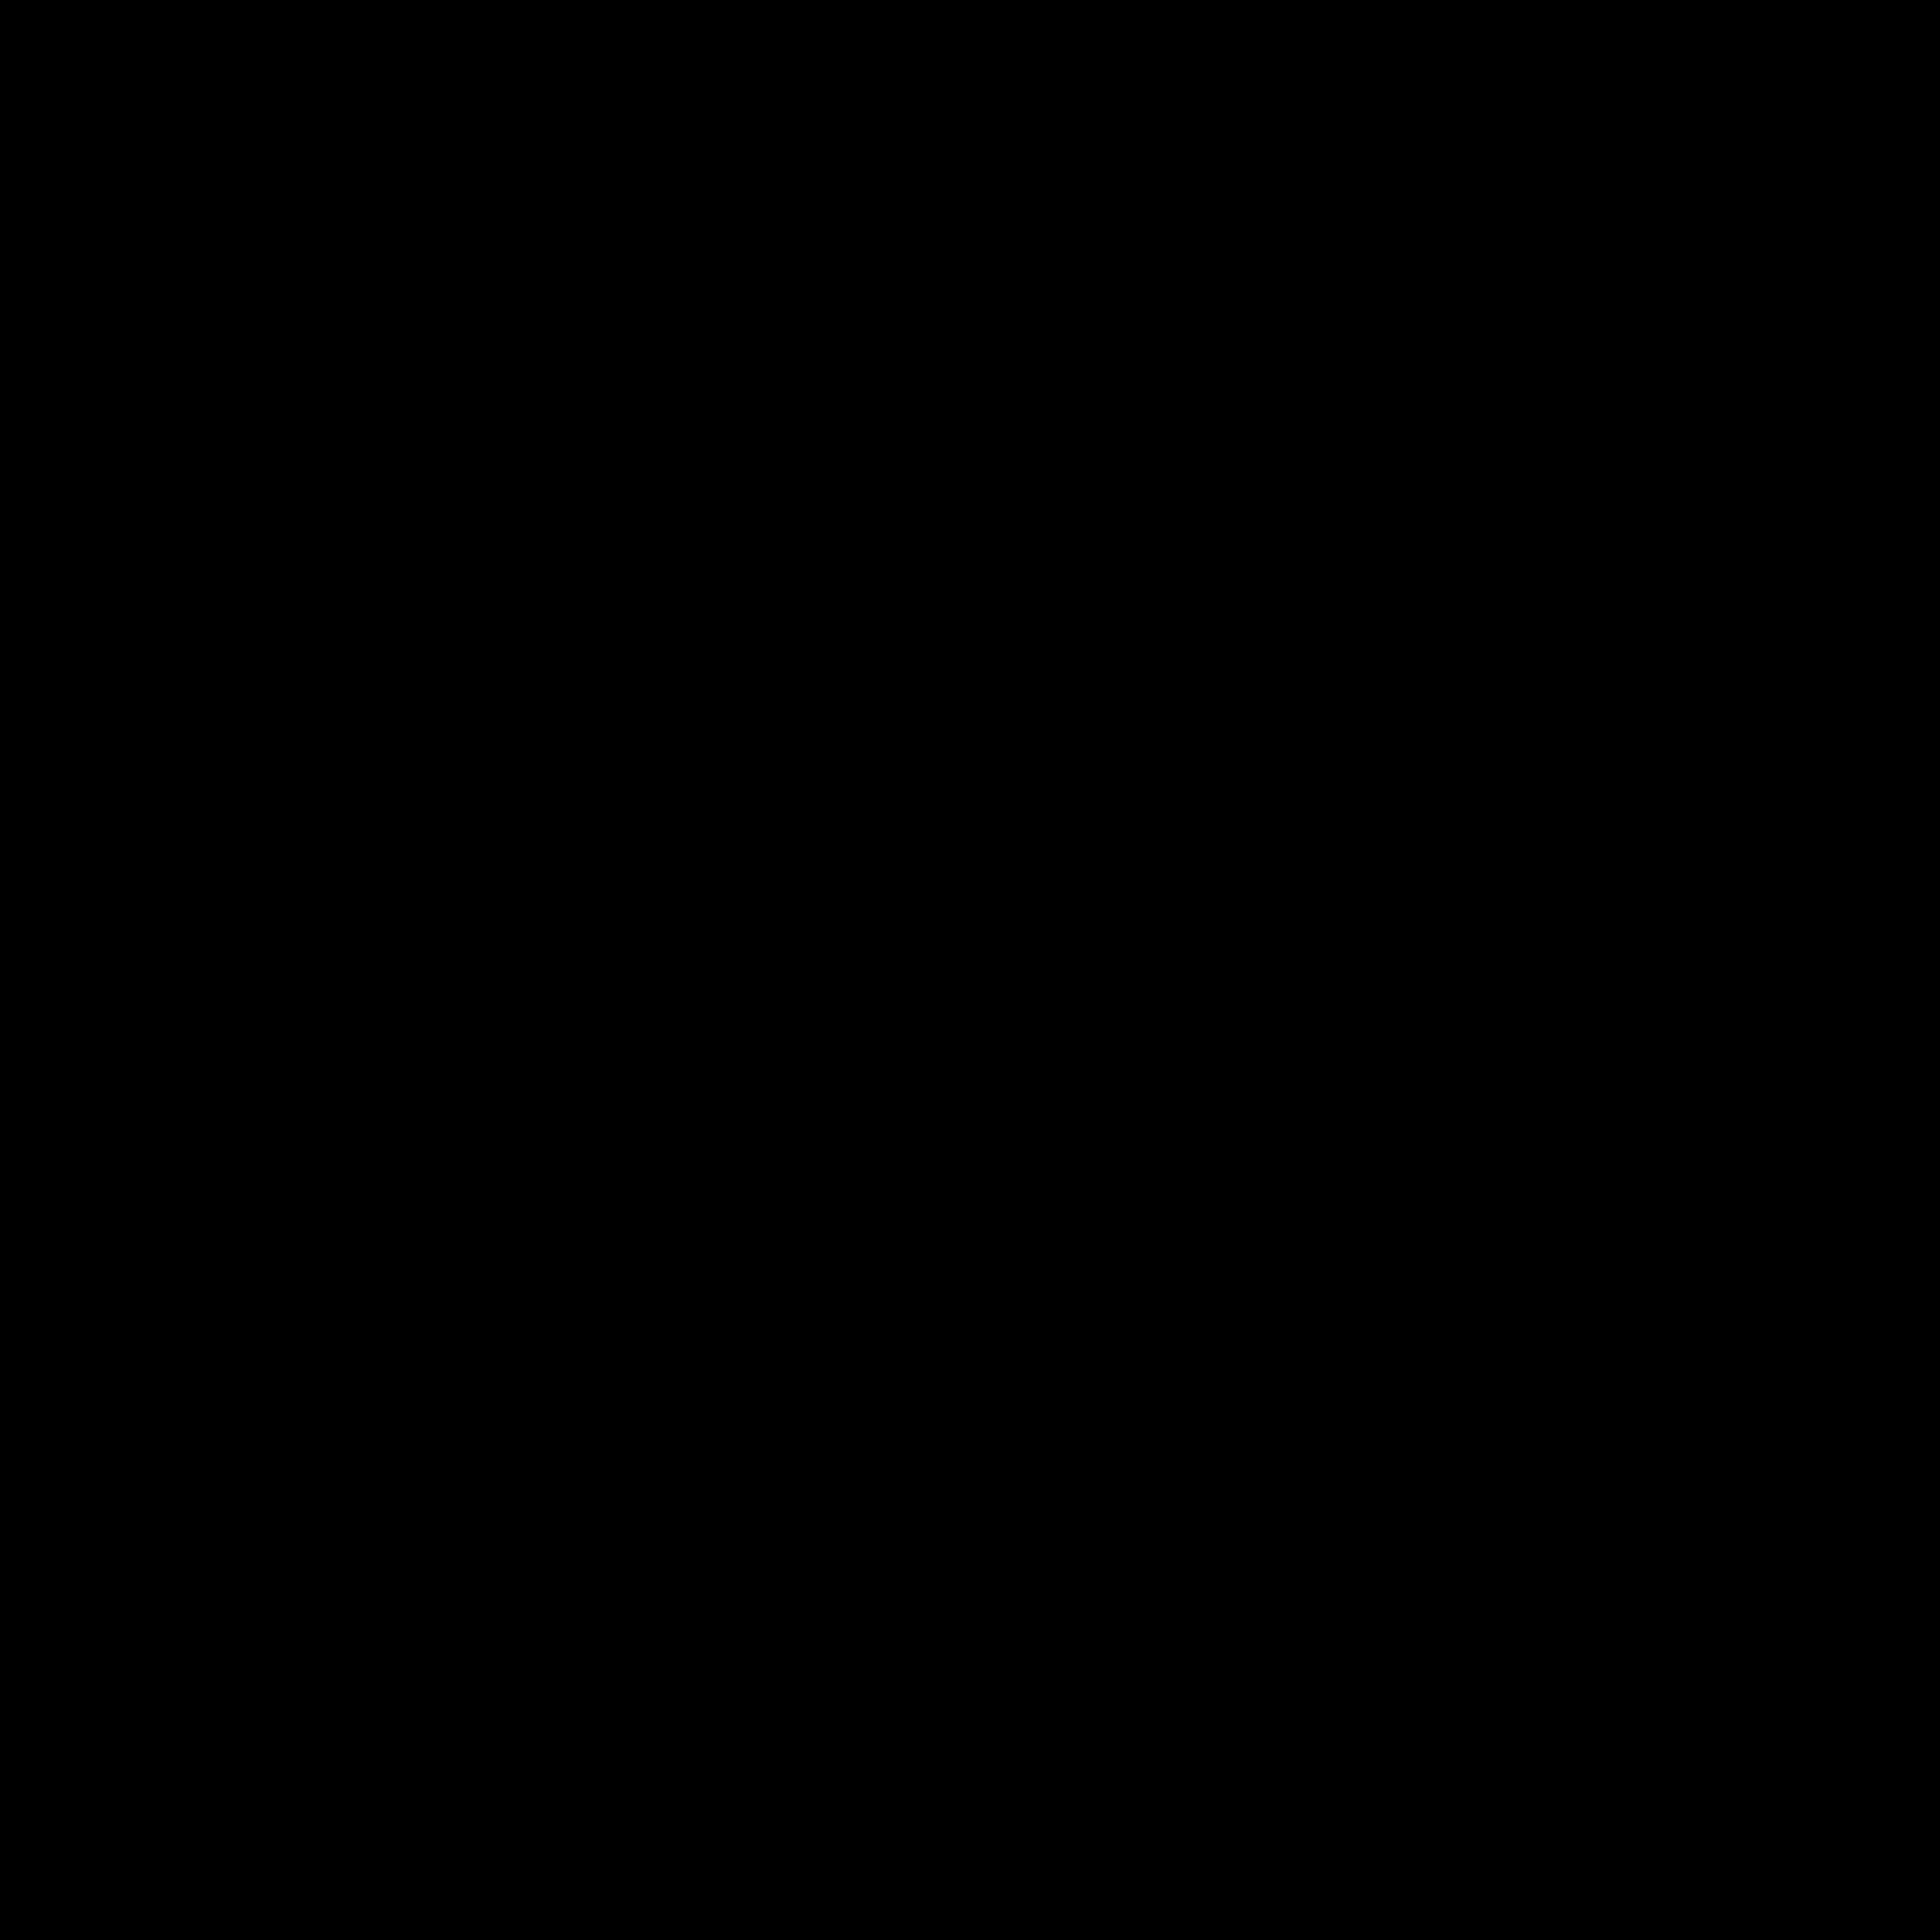 ernst-young-1-logo-png-transparent.png